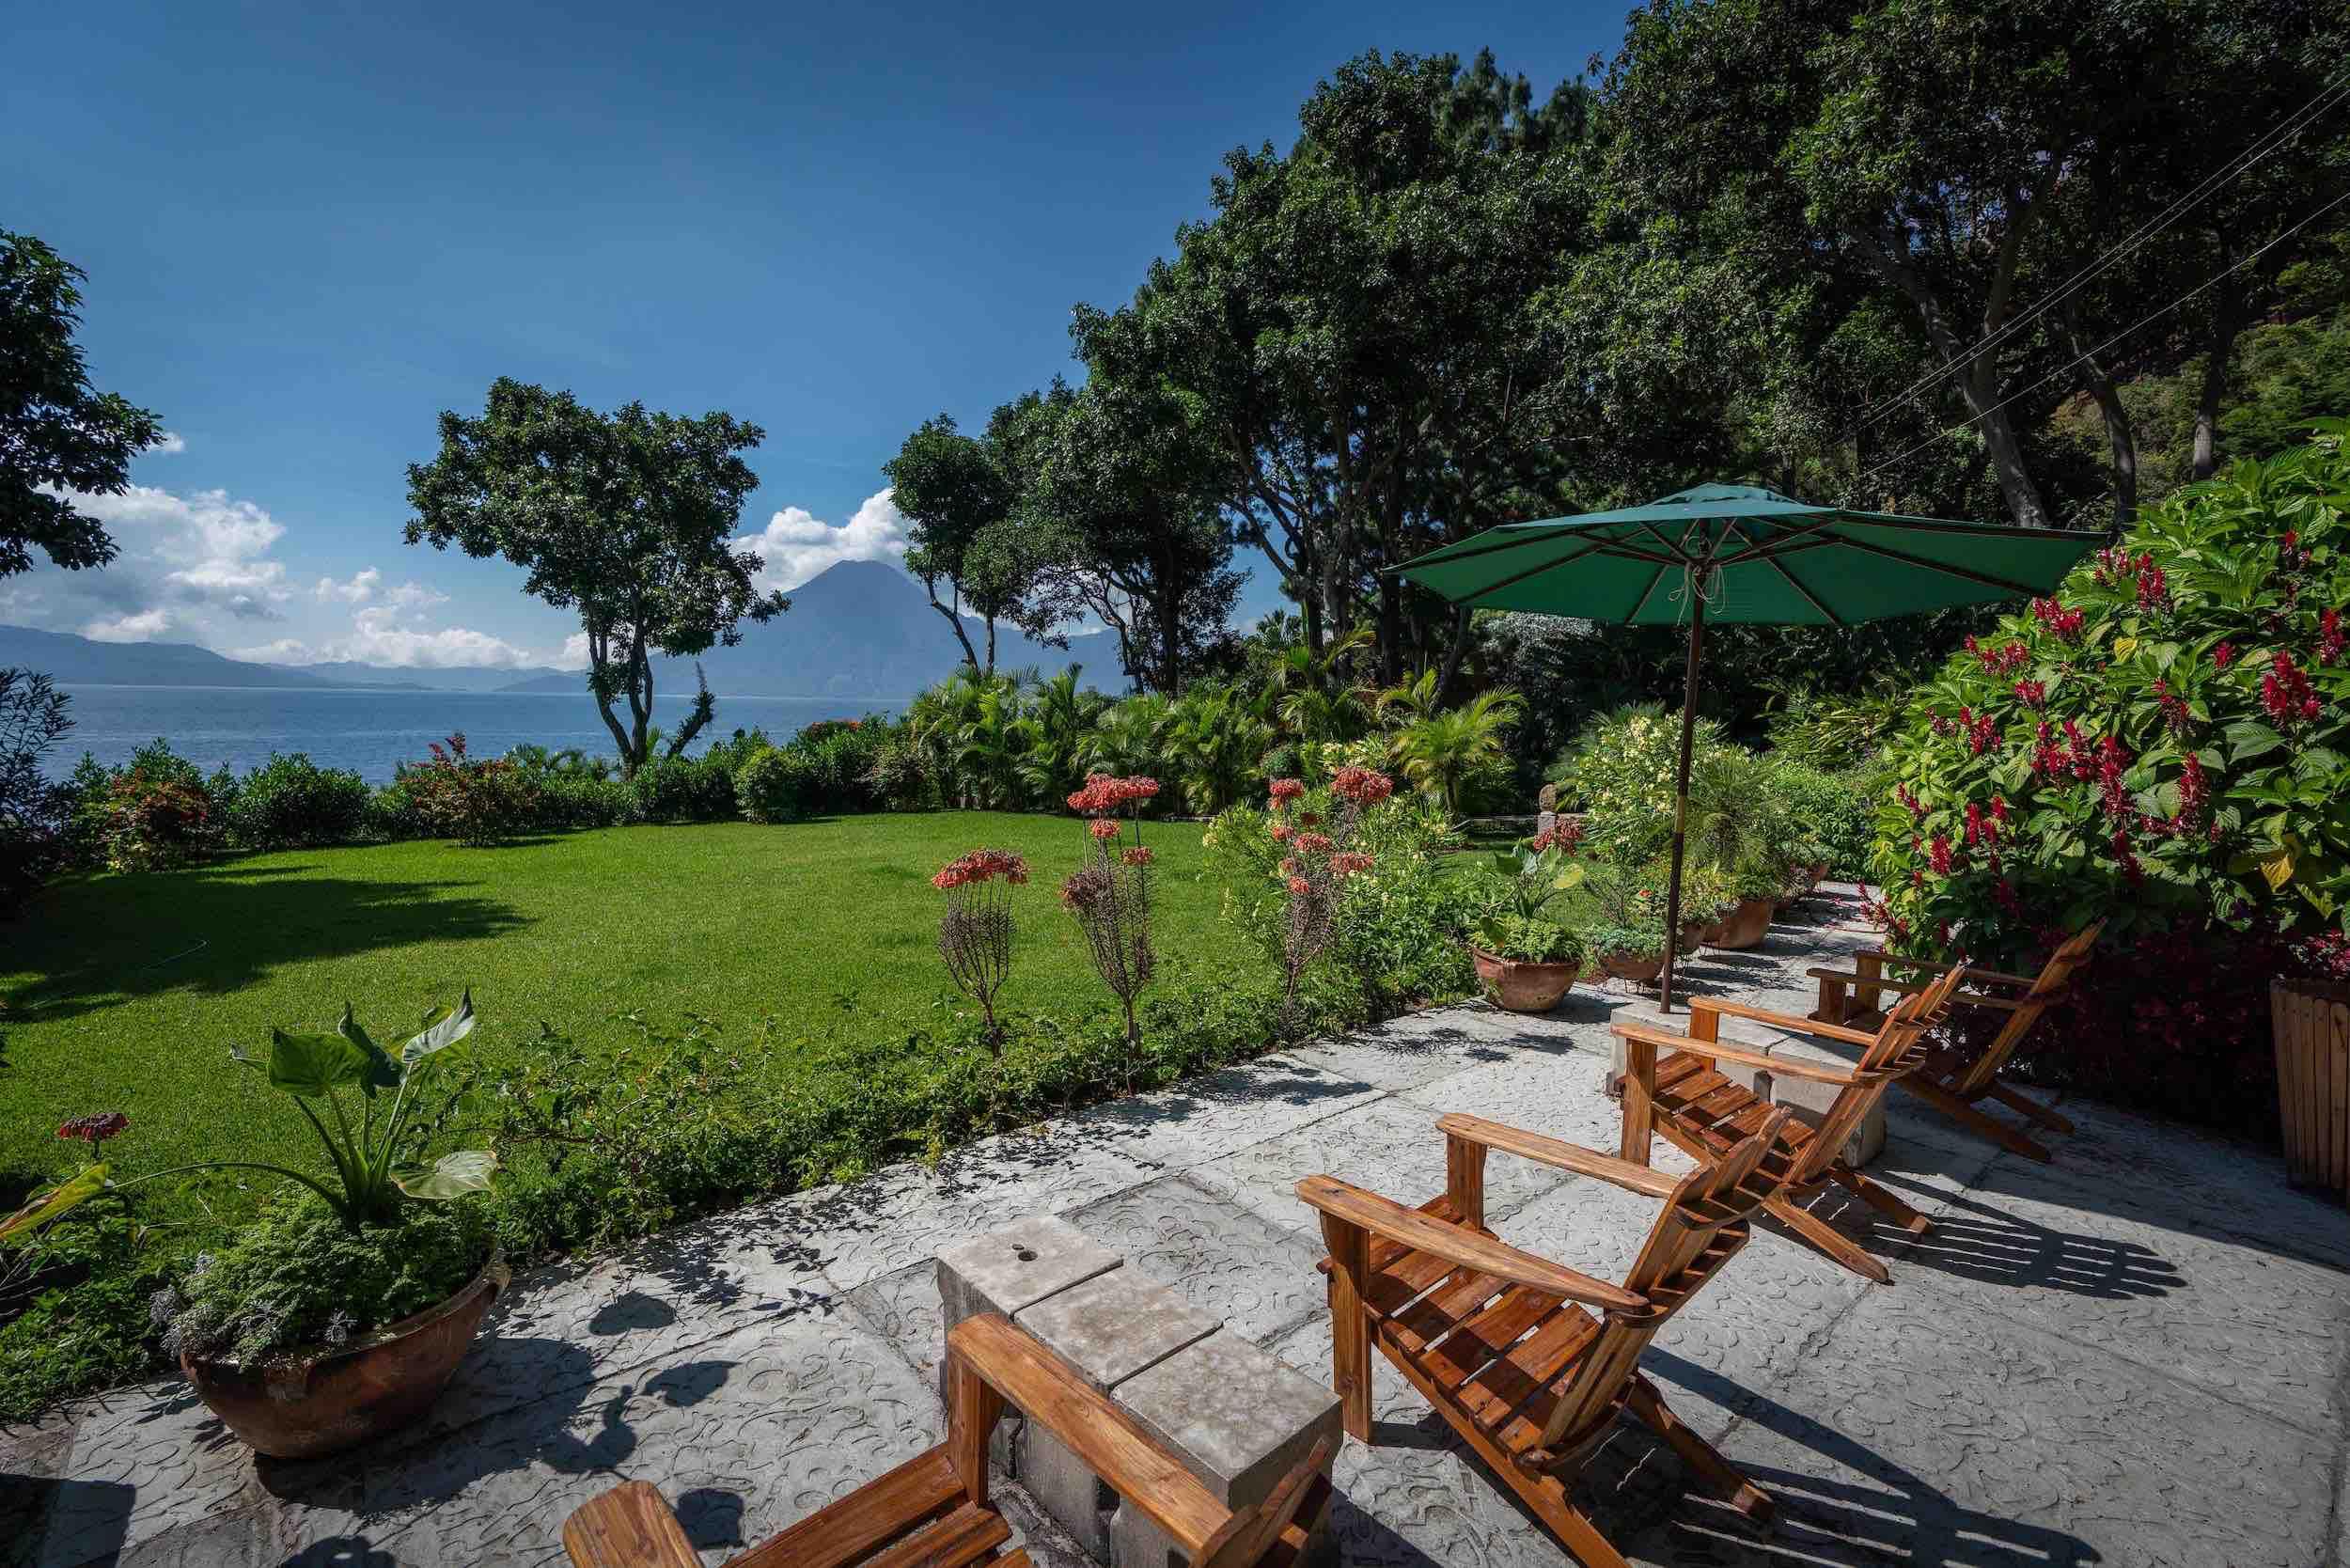 casaprana-facilities-garden-lake view.jpeg